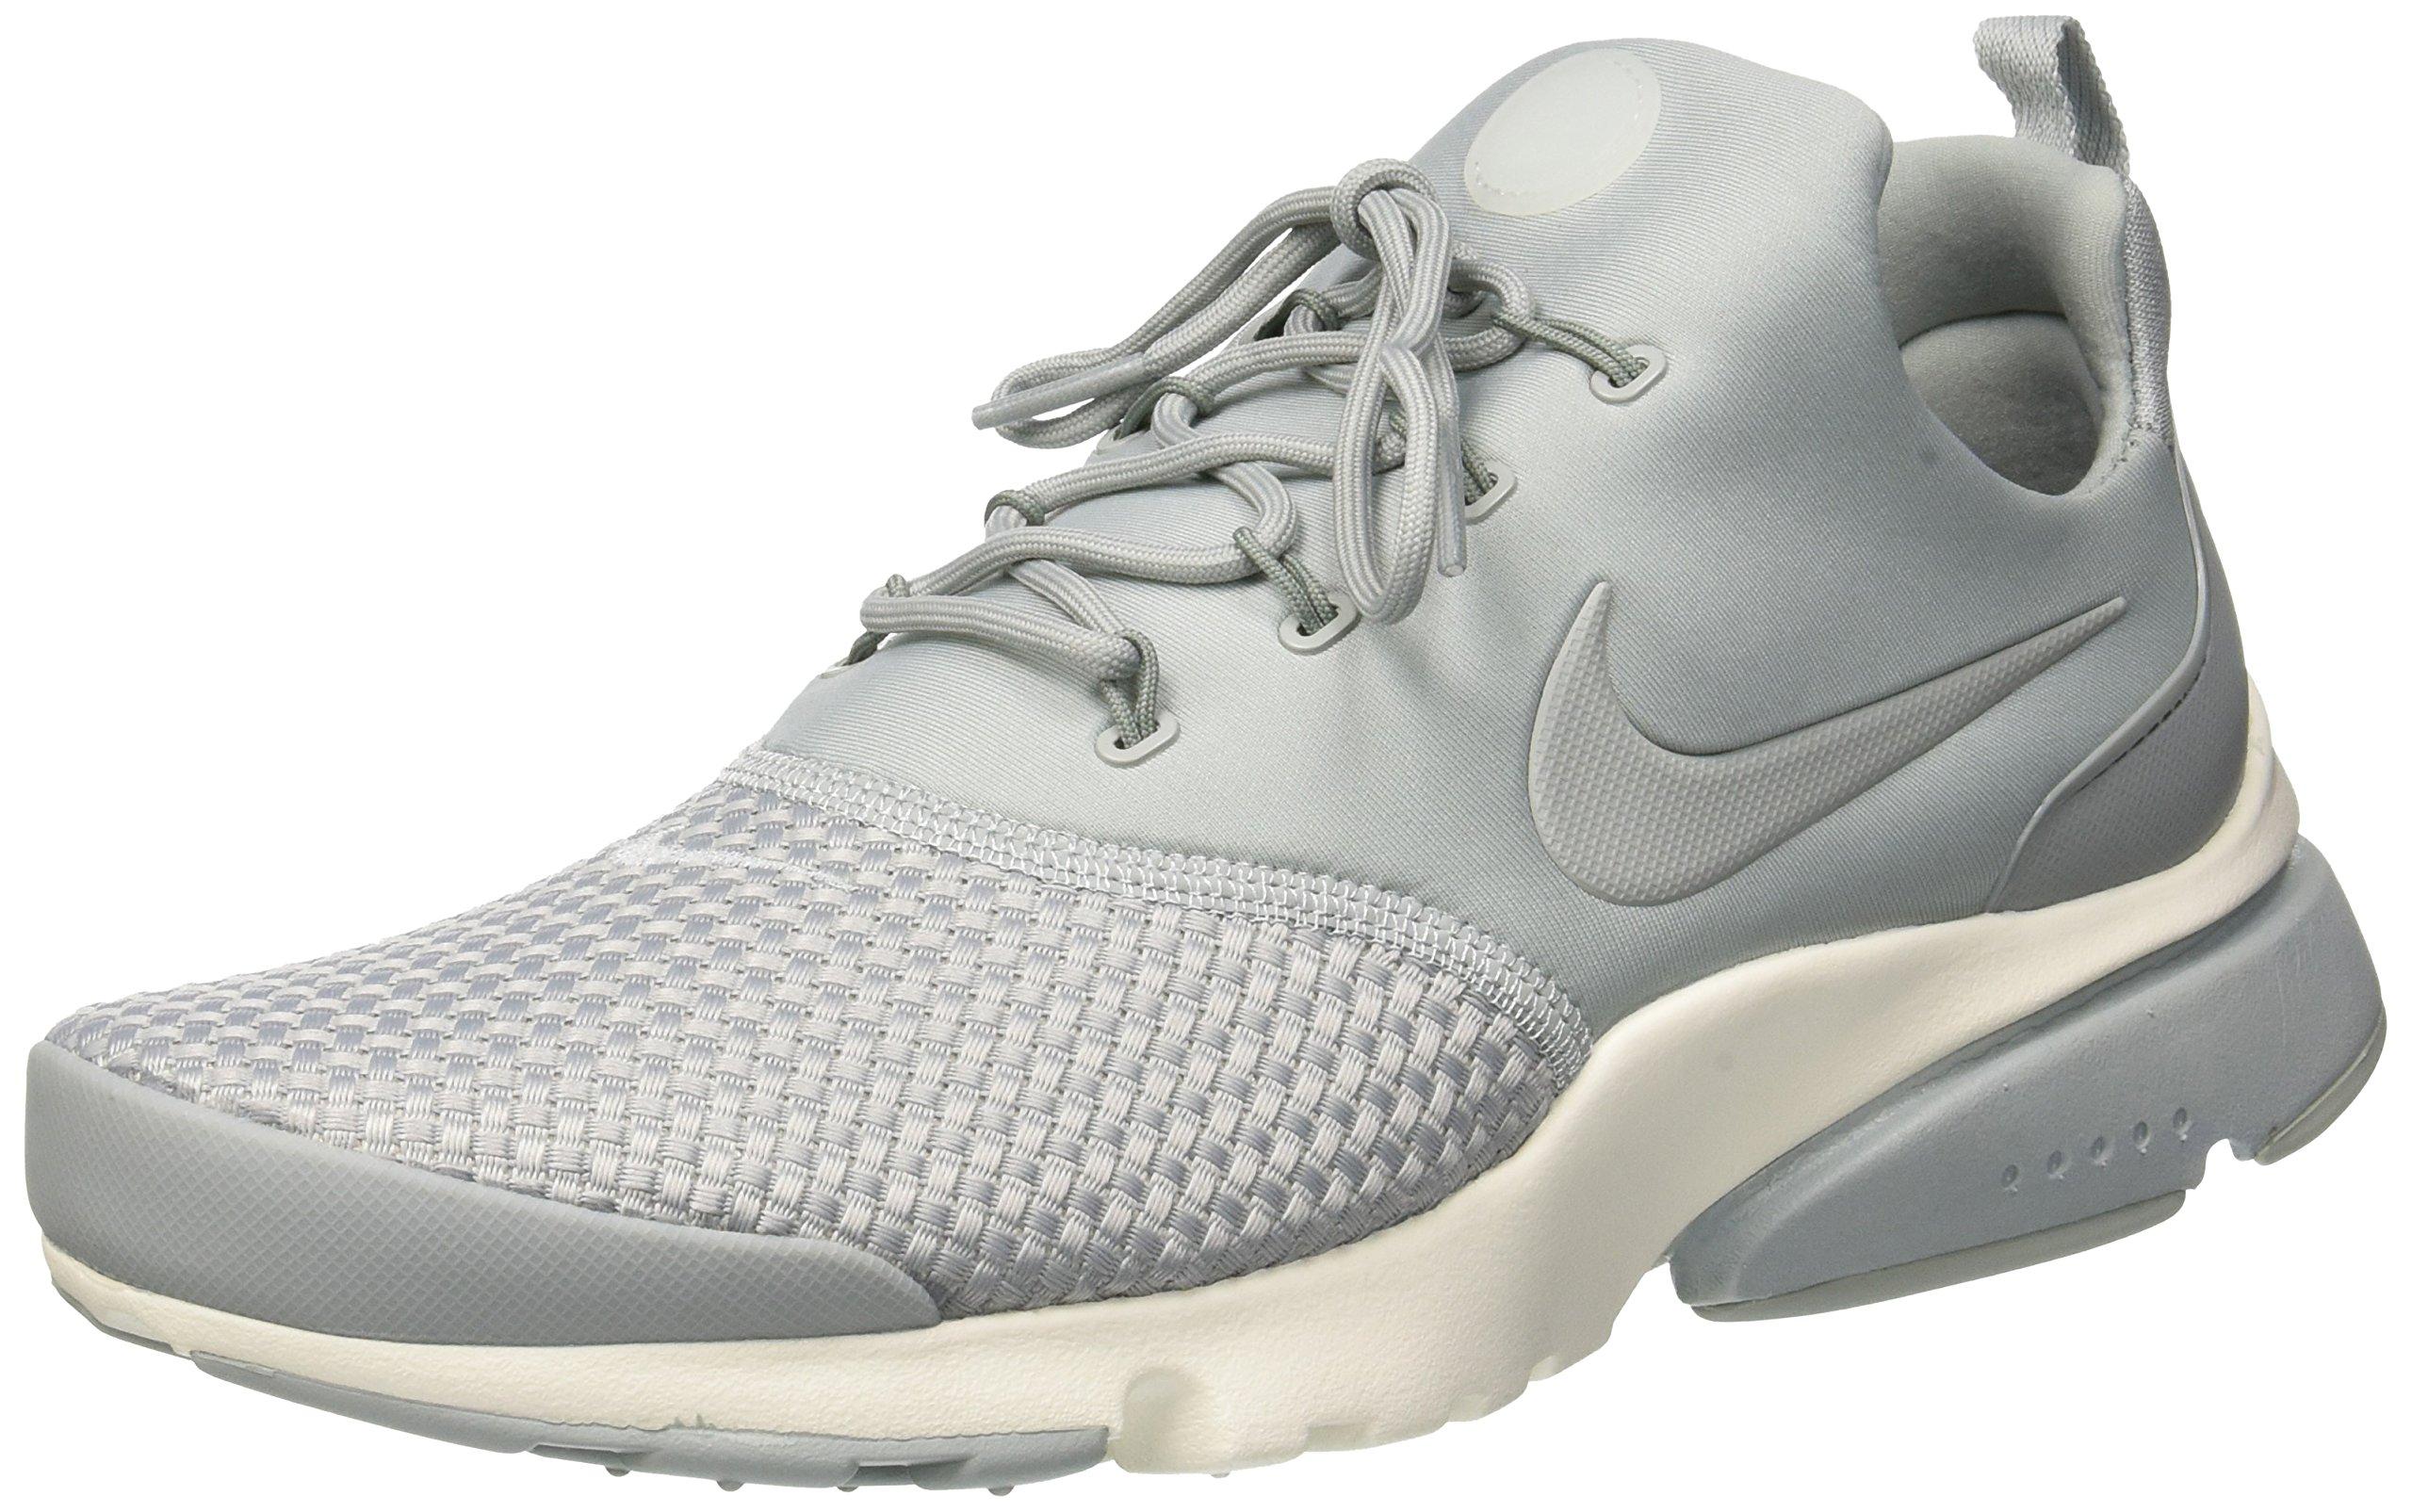 48ac02b01de8 Galleon - NIKE Presto Fly SE Mens Running Trainers 908020 Sneakers Shoes  (UK 9 US 10 EU 44